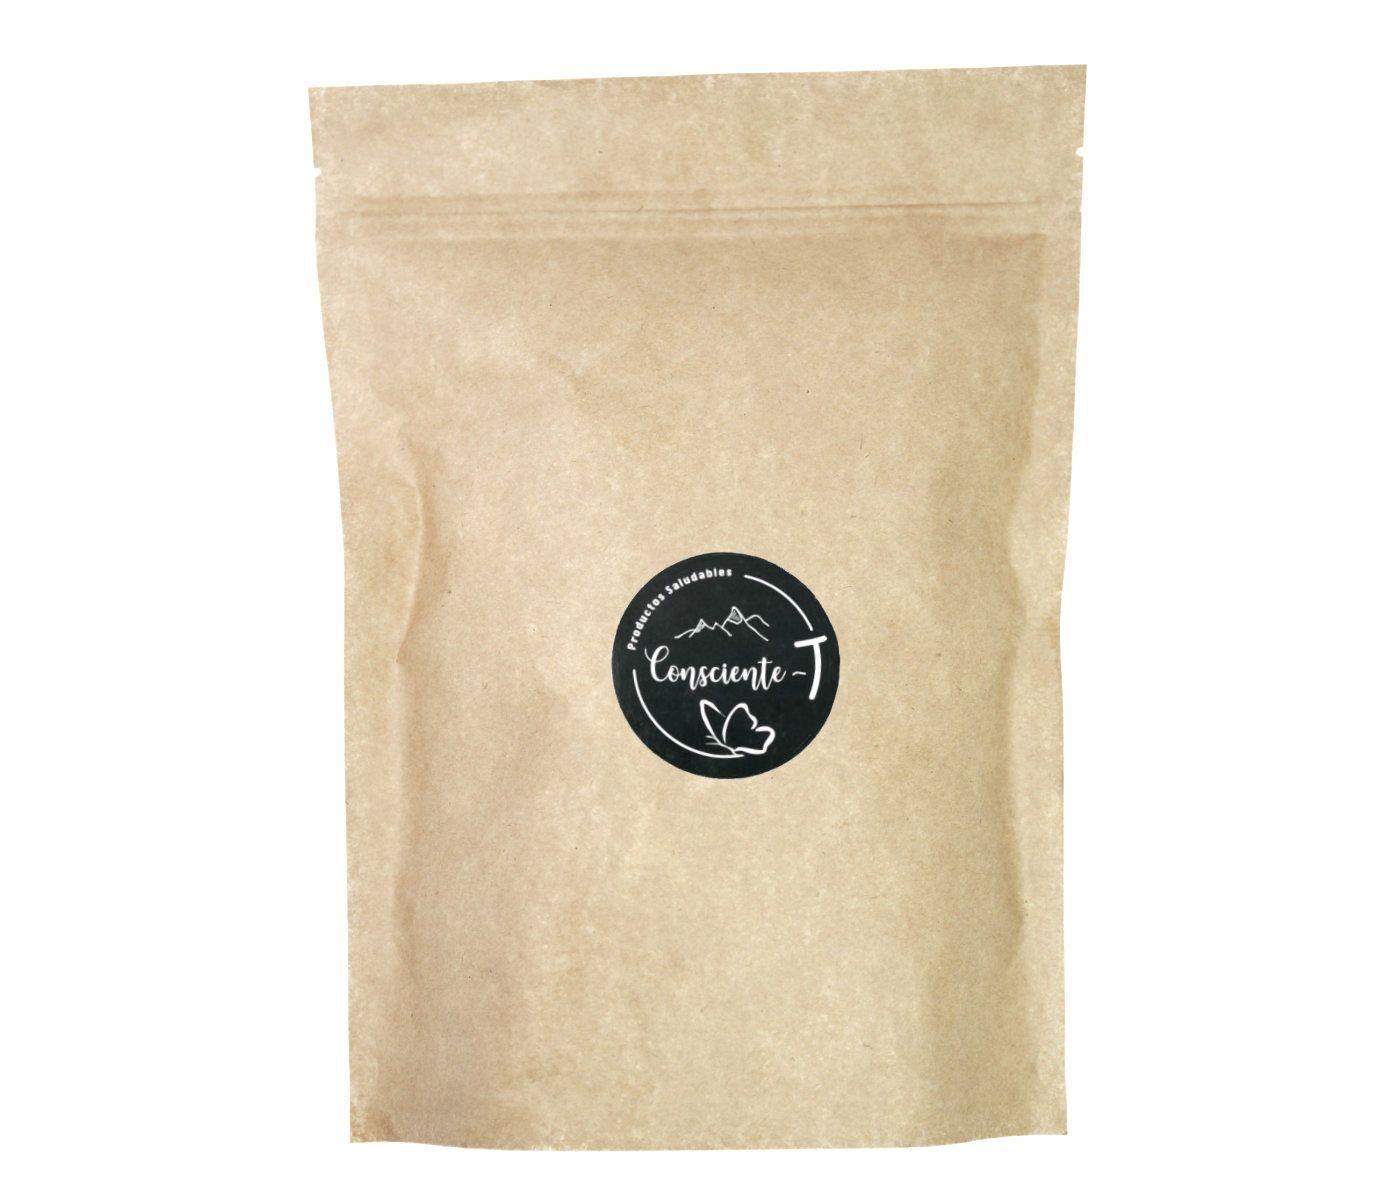 granola-gourmet-consciente-t-jengibre-mix